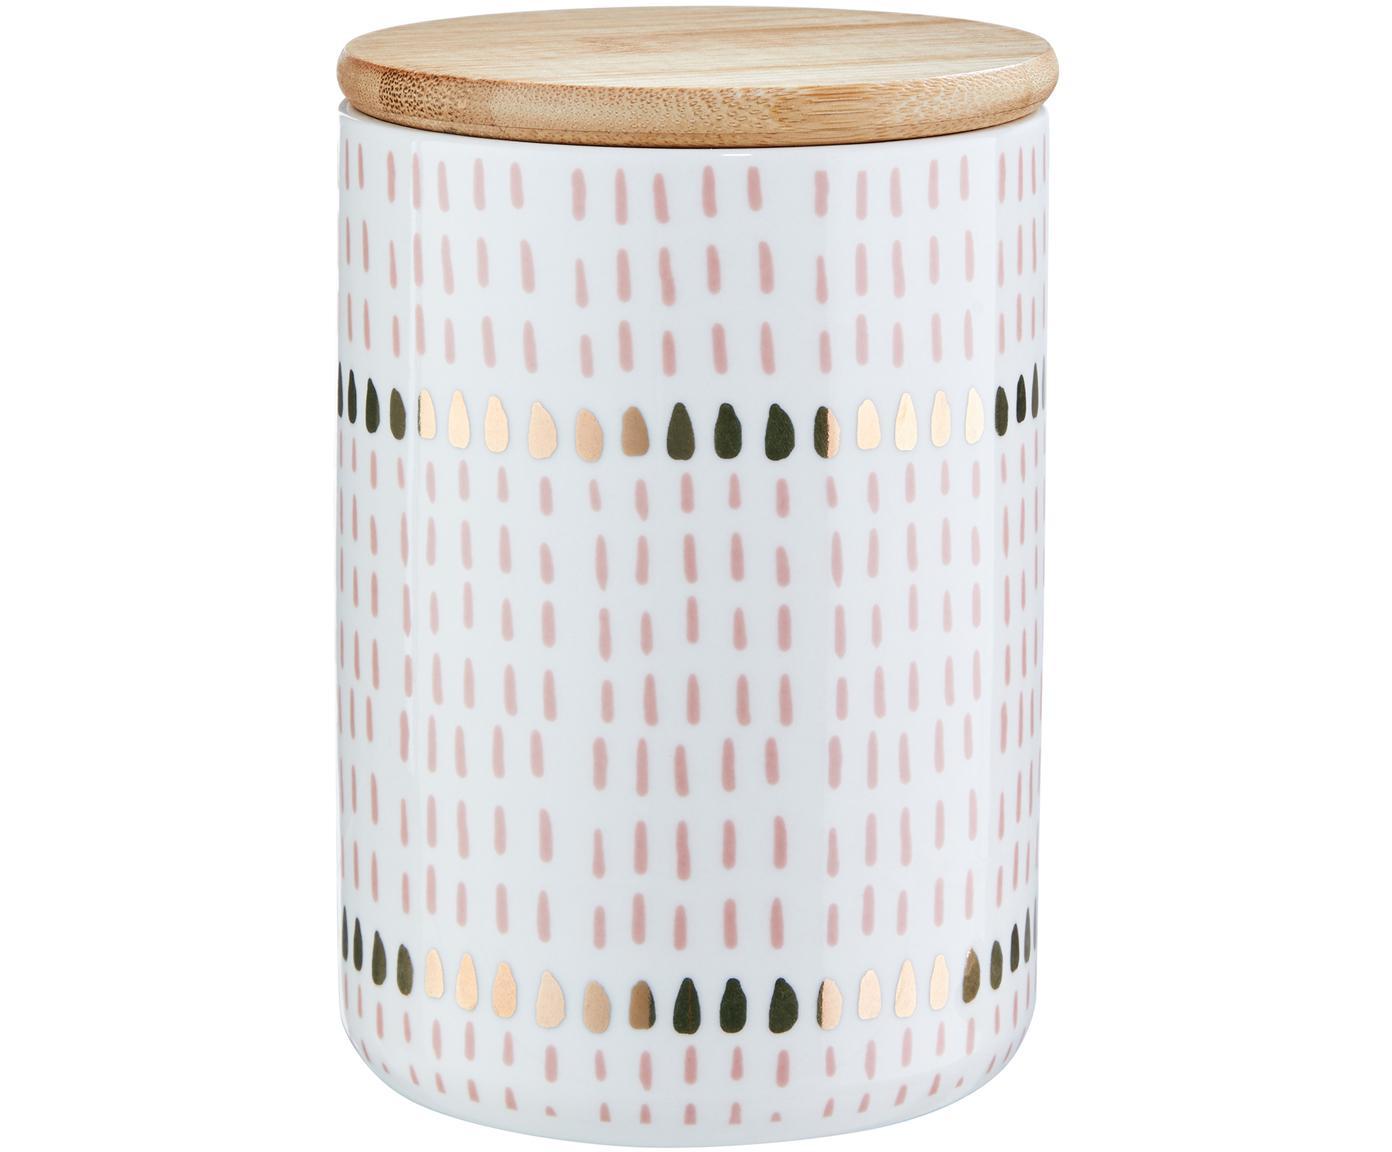 Opbergpot Drops, Pot: dolomiet, Deksel: bamboe, silicone, Roze, Ø 10 cm